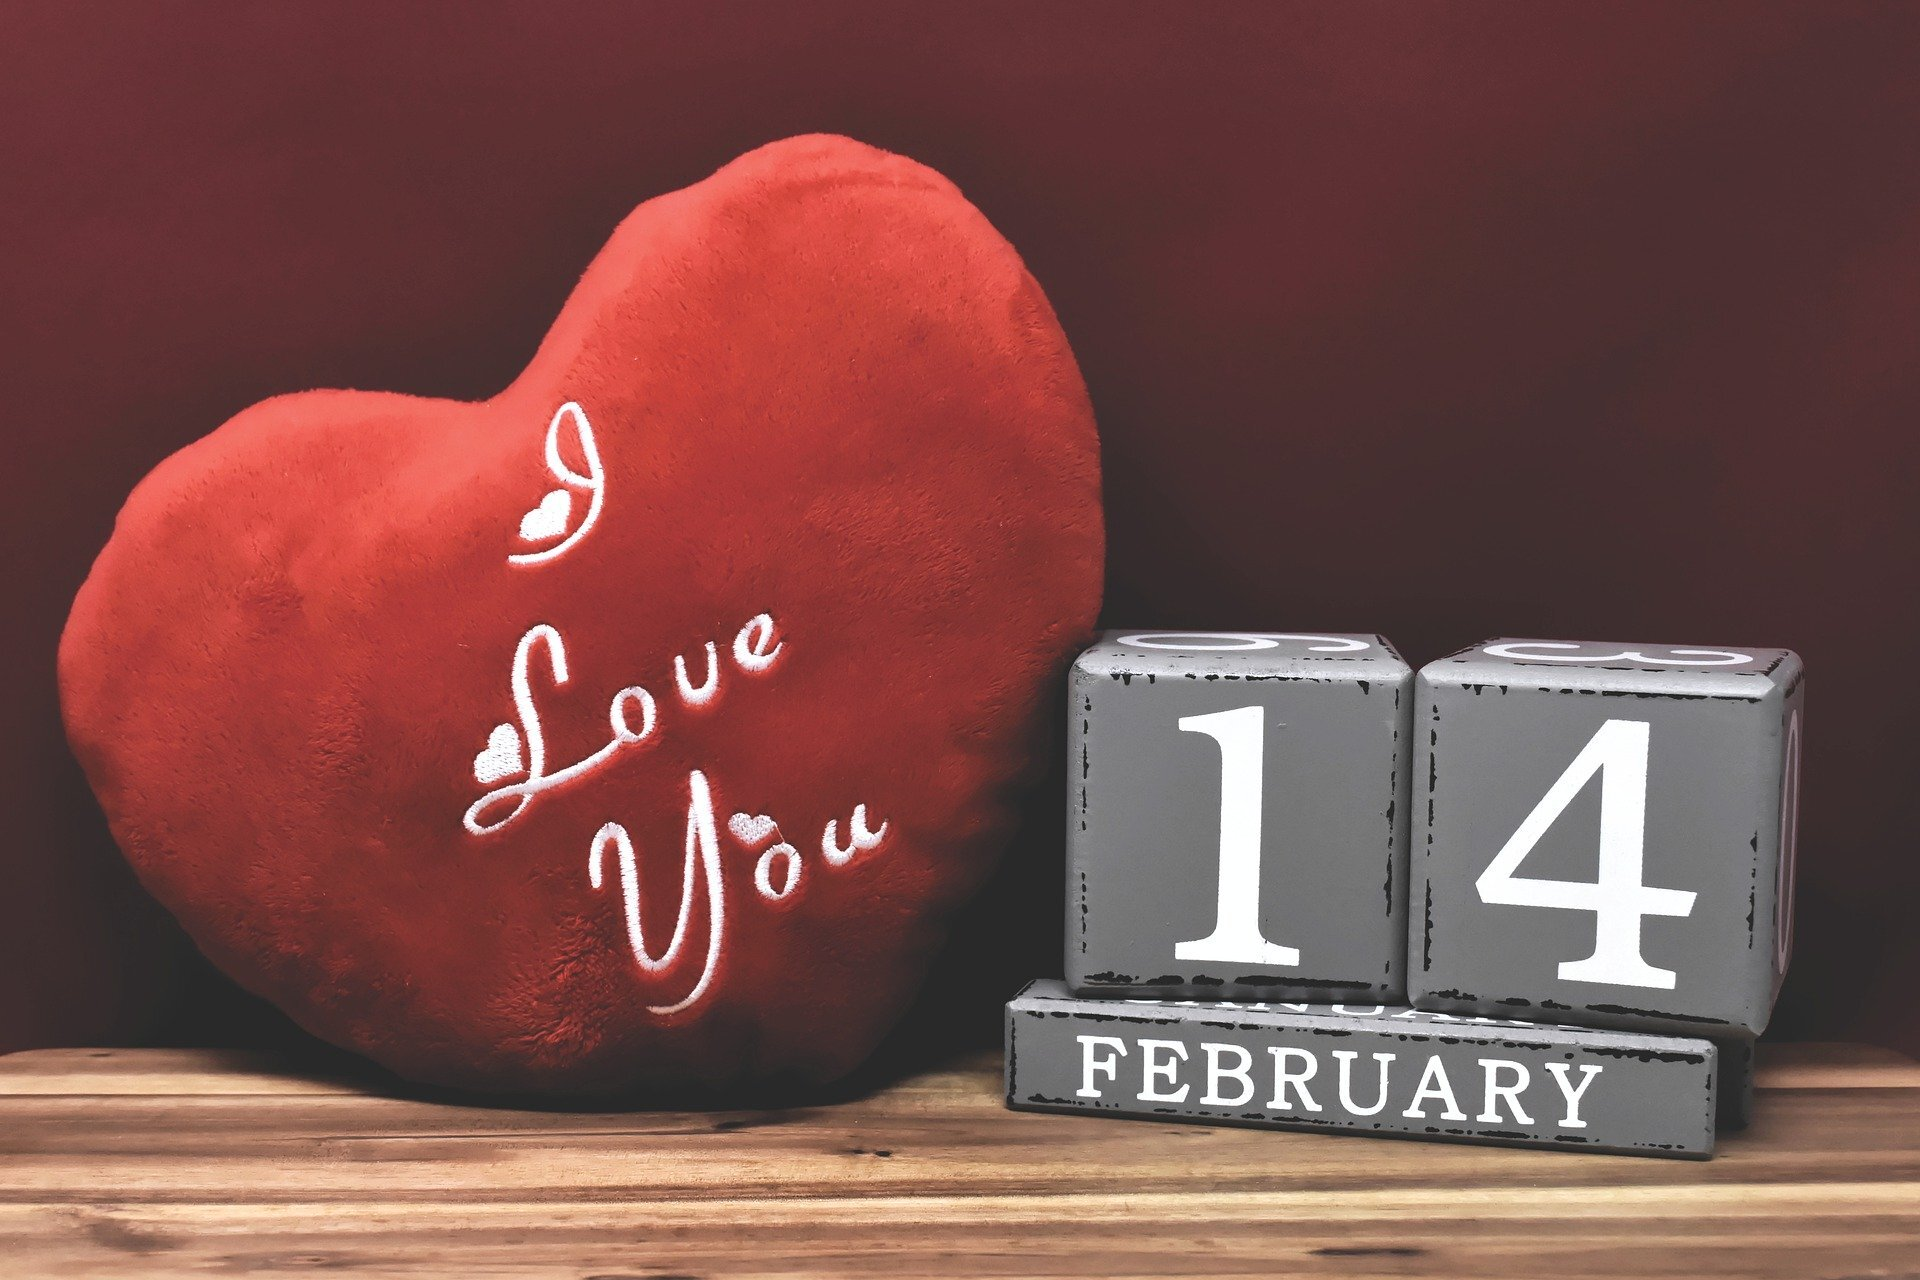 valentines-day-4833674_1920